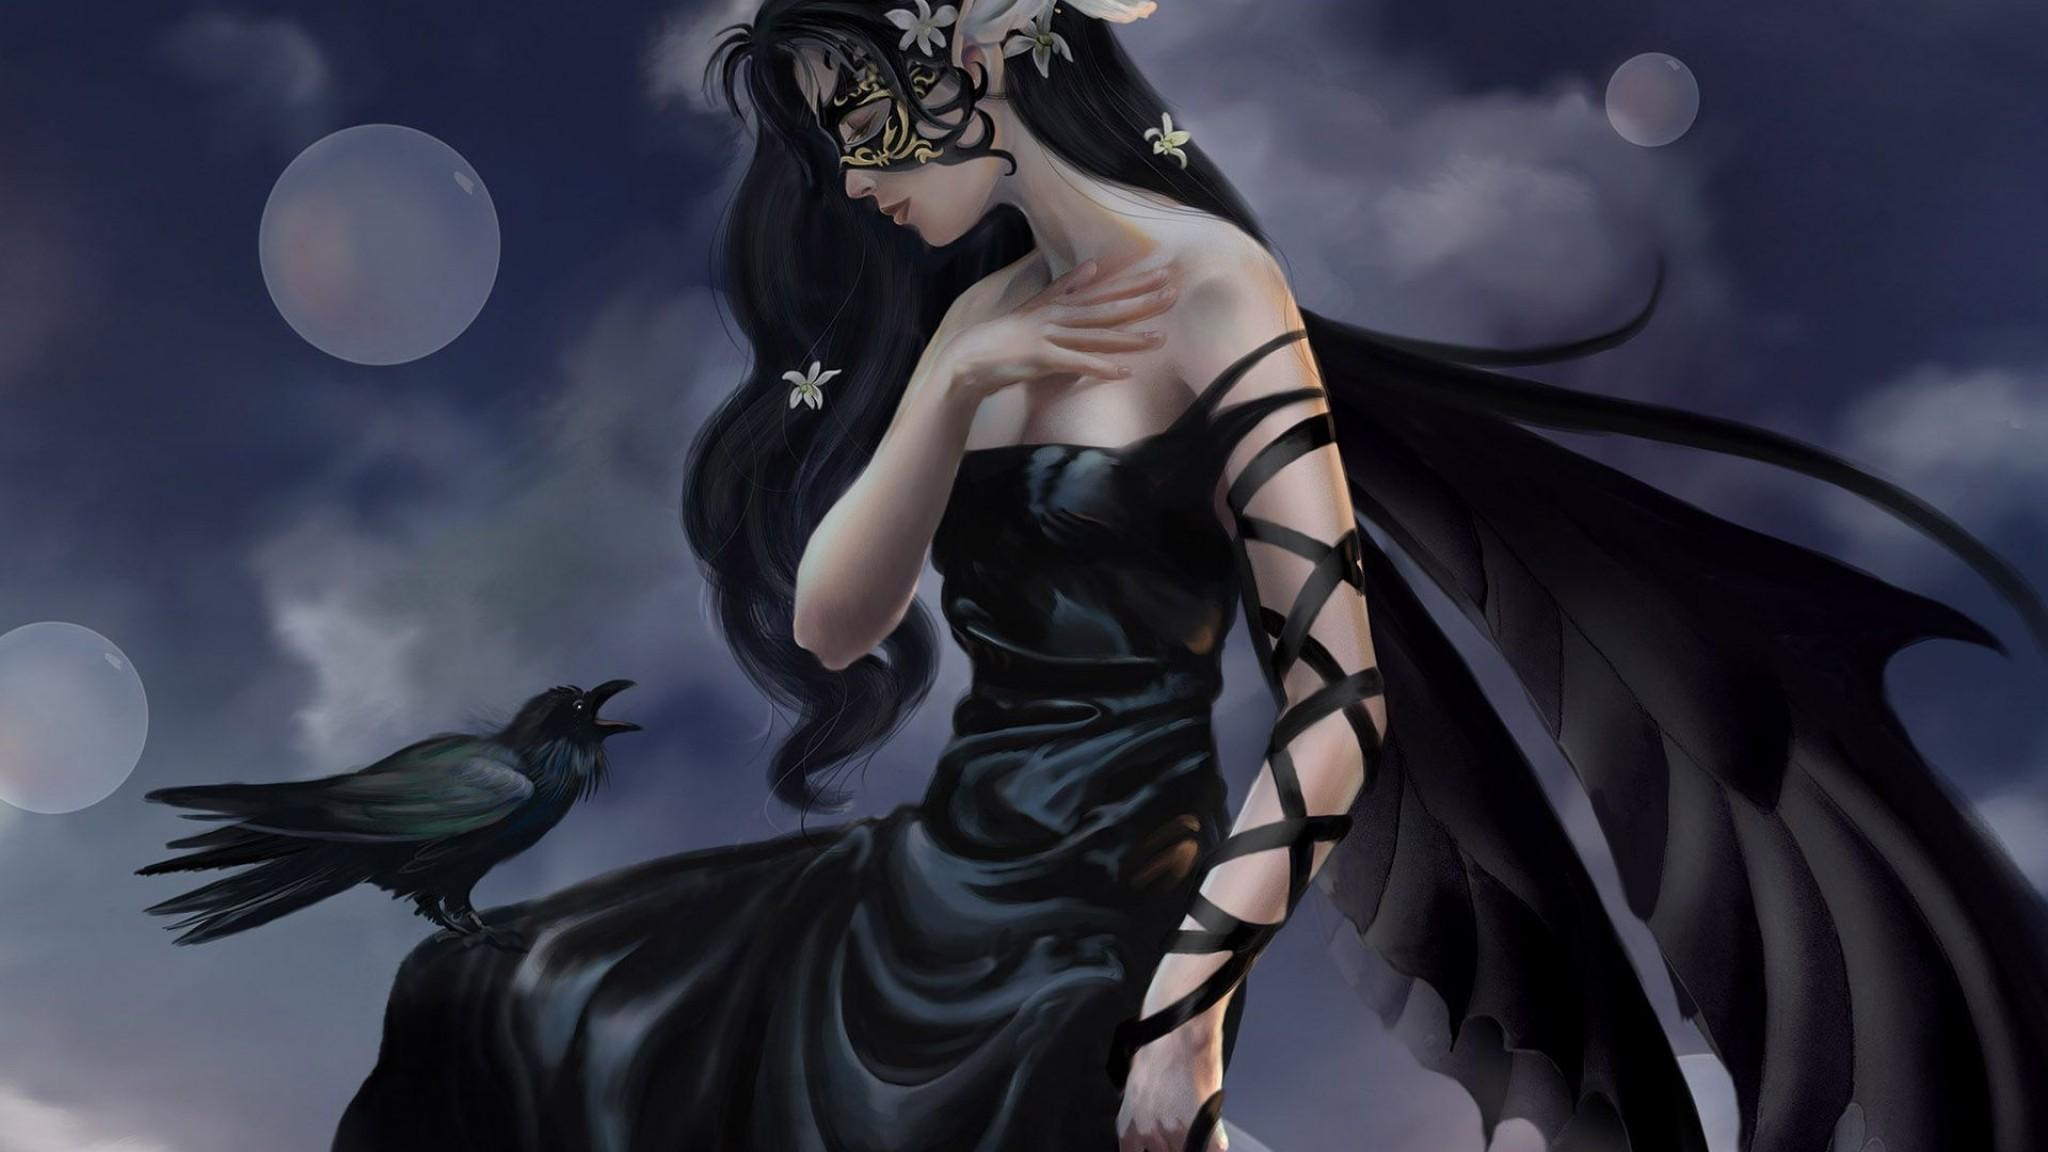 Res: 2048x1152, Gothic Fairy Image Desktop #h228820133, 0.25 Mb